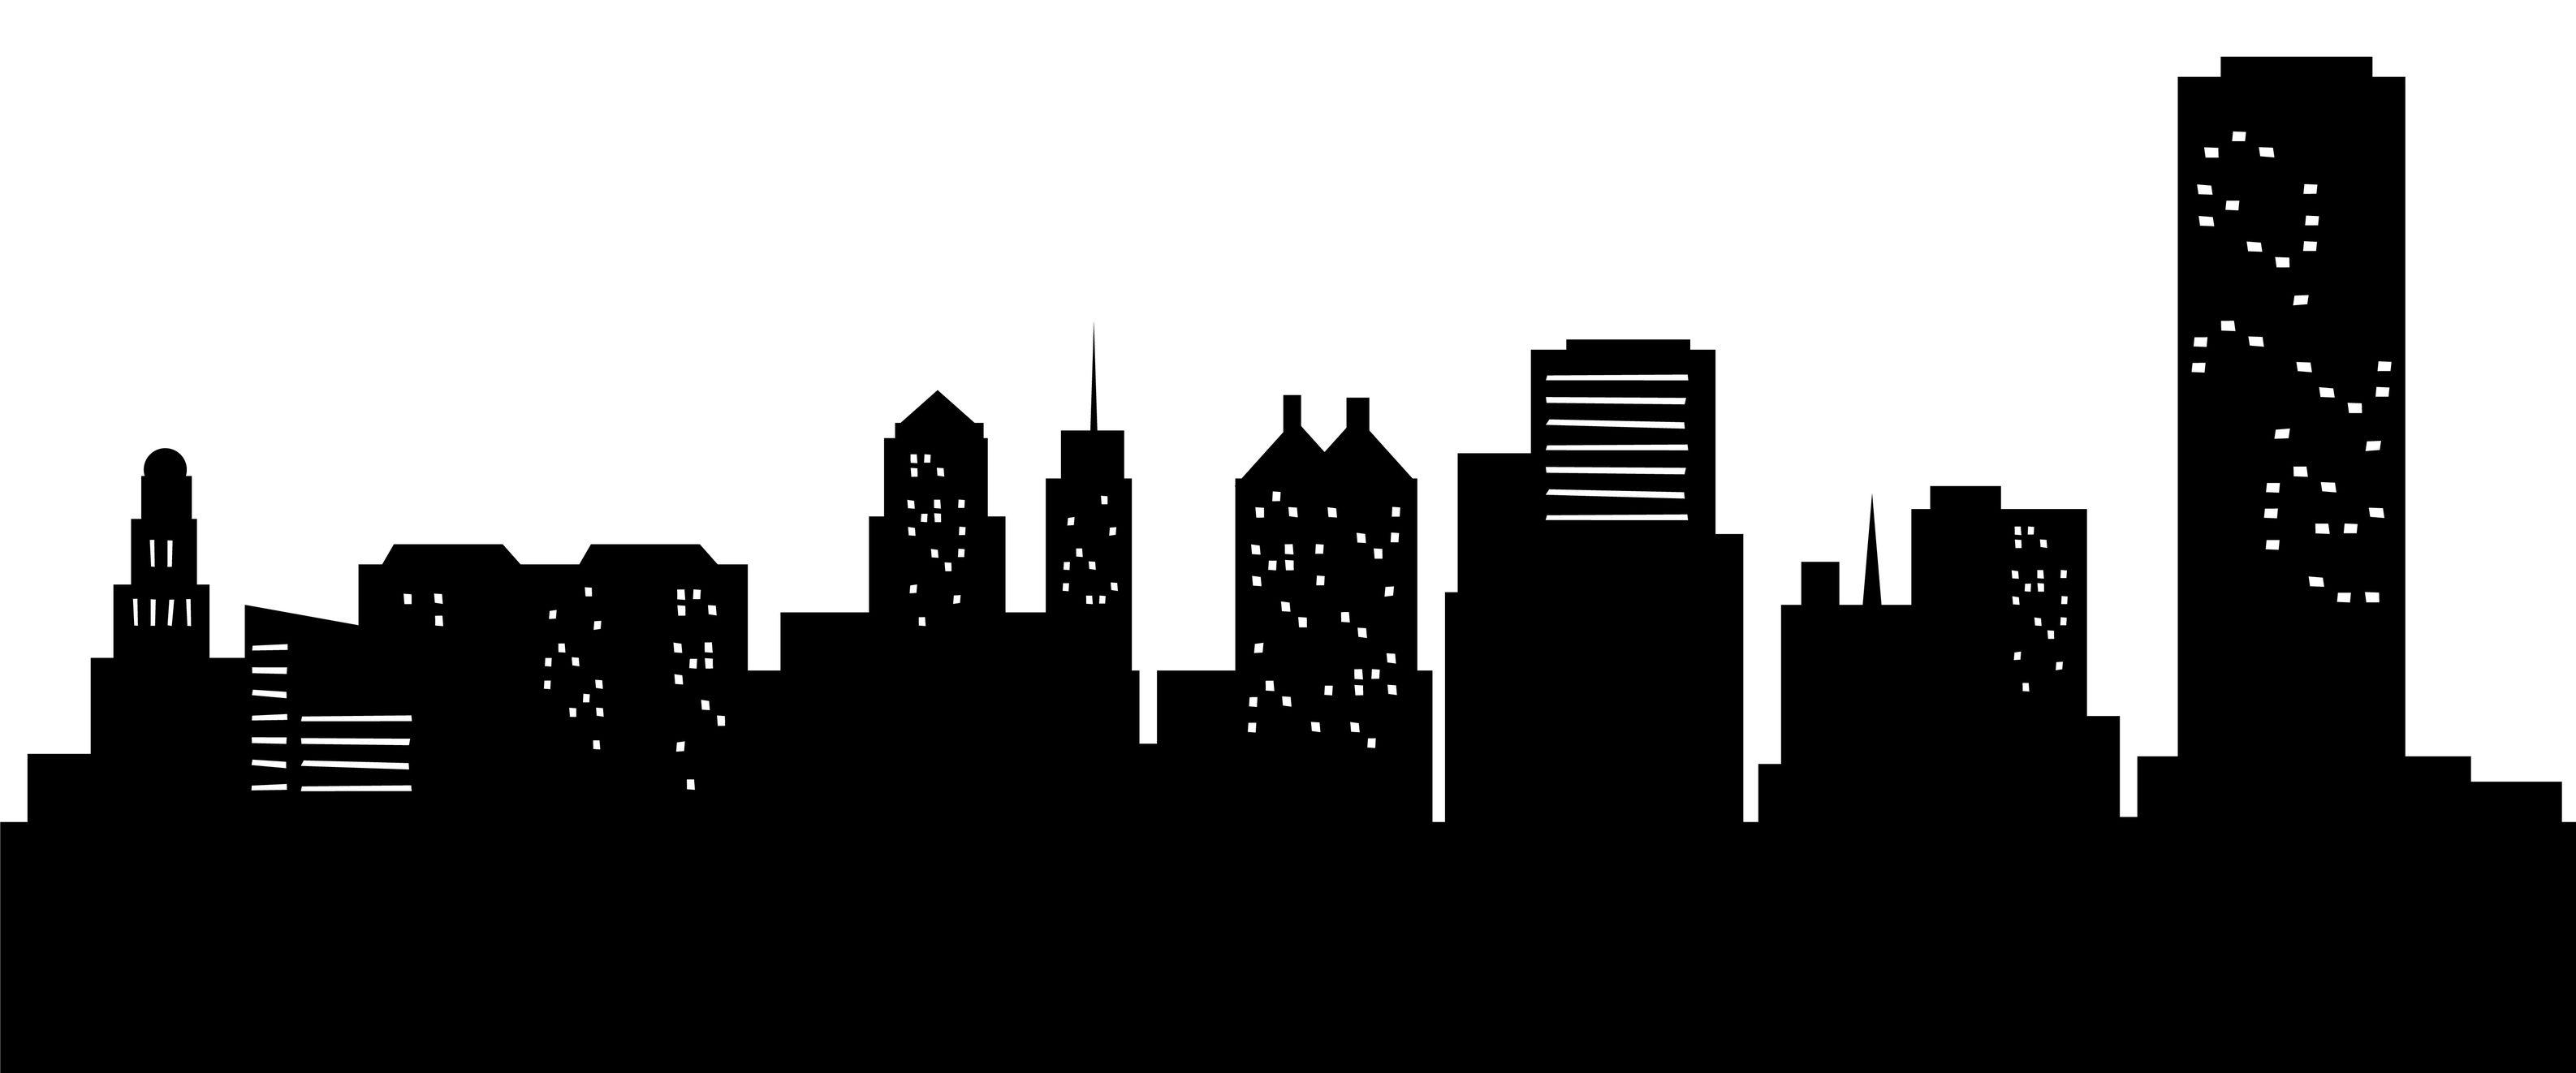 3173x1322 Cityscape Clipart Illustration